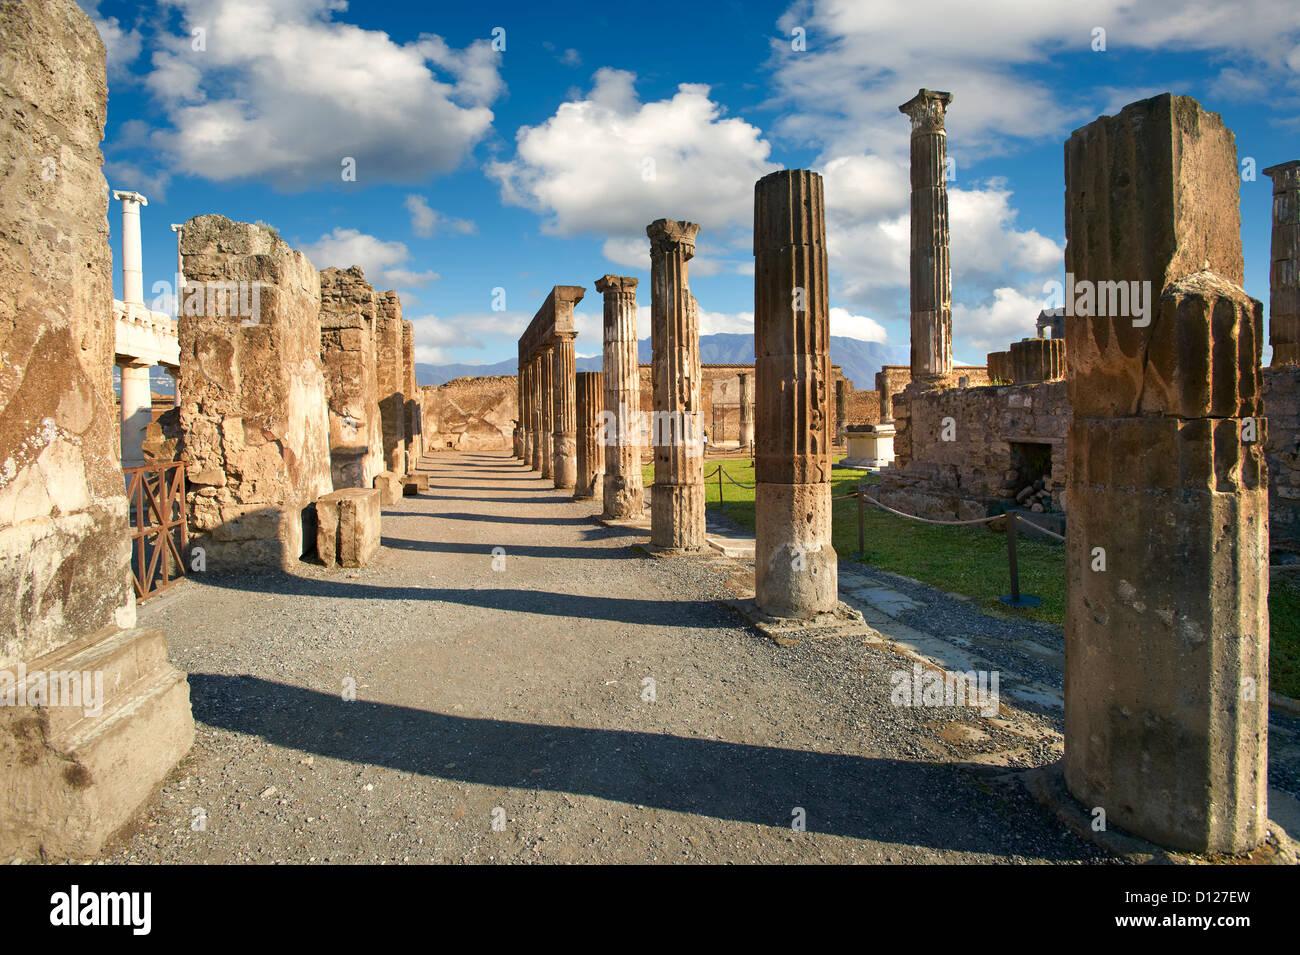 Roman Temple of Apollo Pompeii archaeological site, Italy - Stock Image